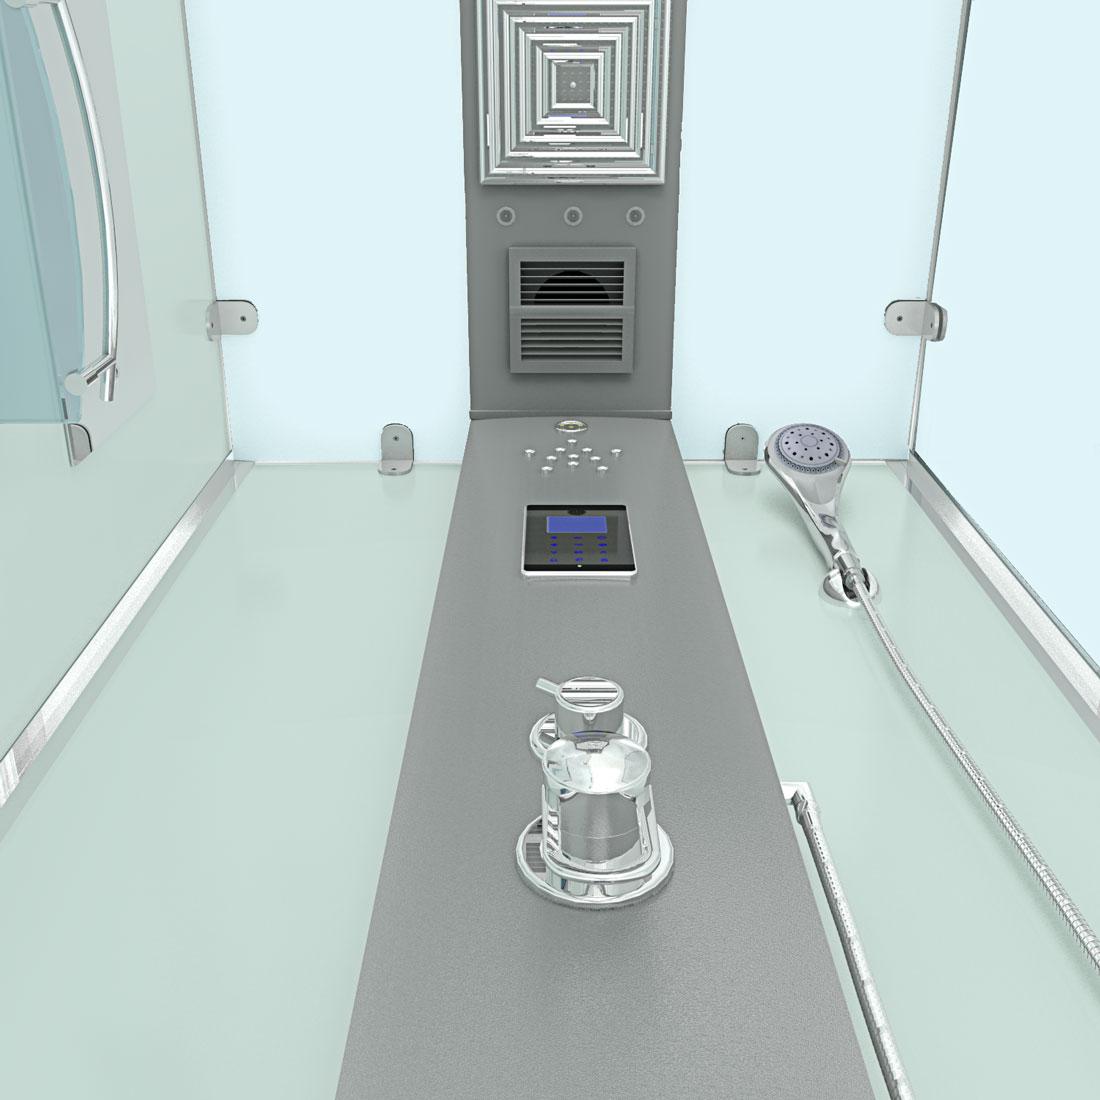 acquavapore dtp6038 8000l dusche duschtempel komplett duschkabine 80x80 ebay. Black Bedroom Furniture Sets. Home Design Ideas